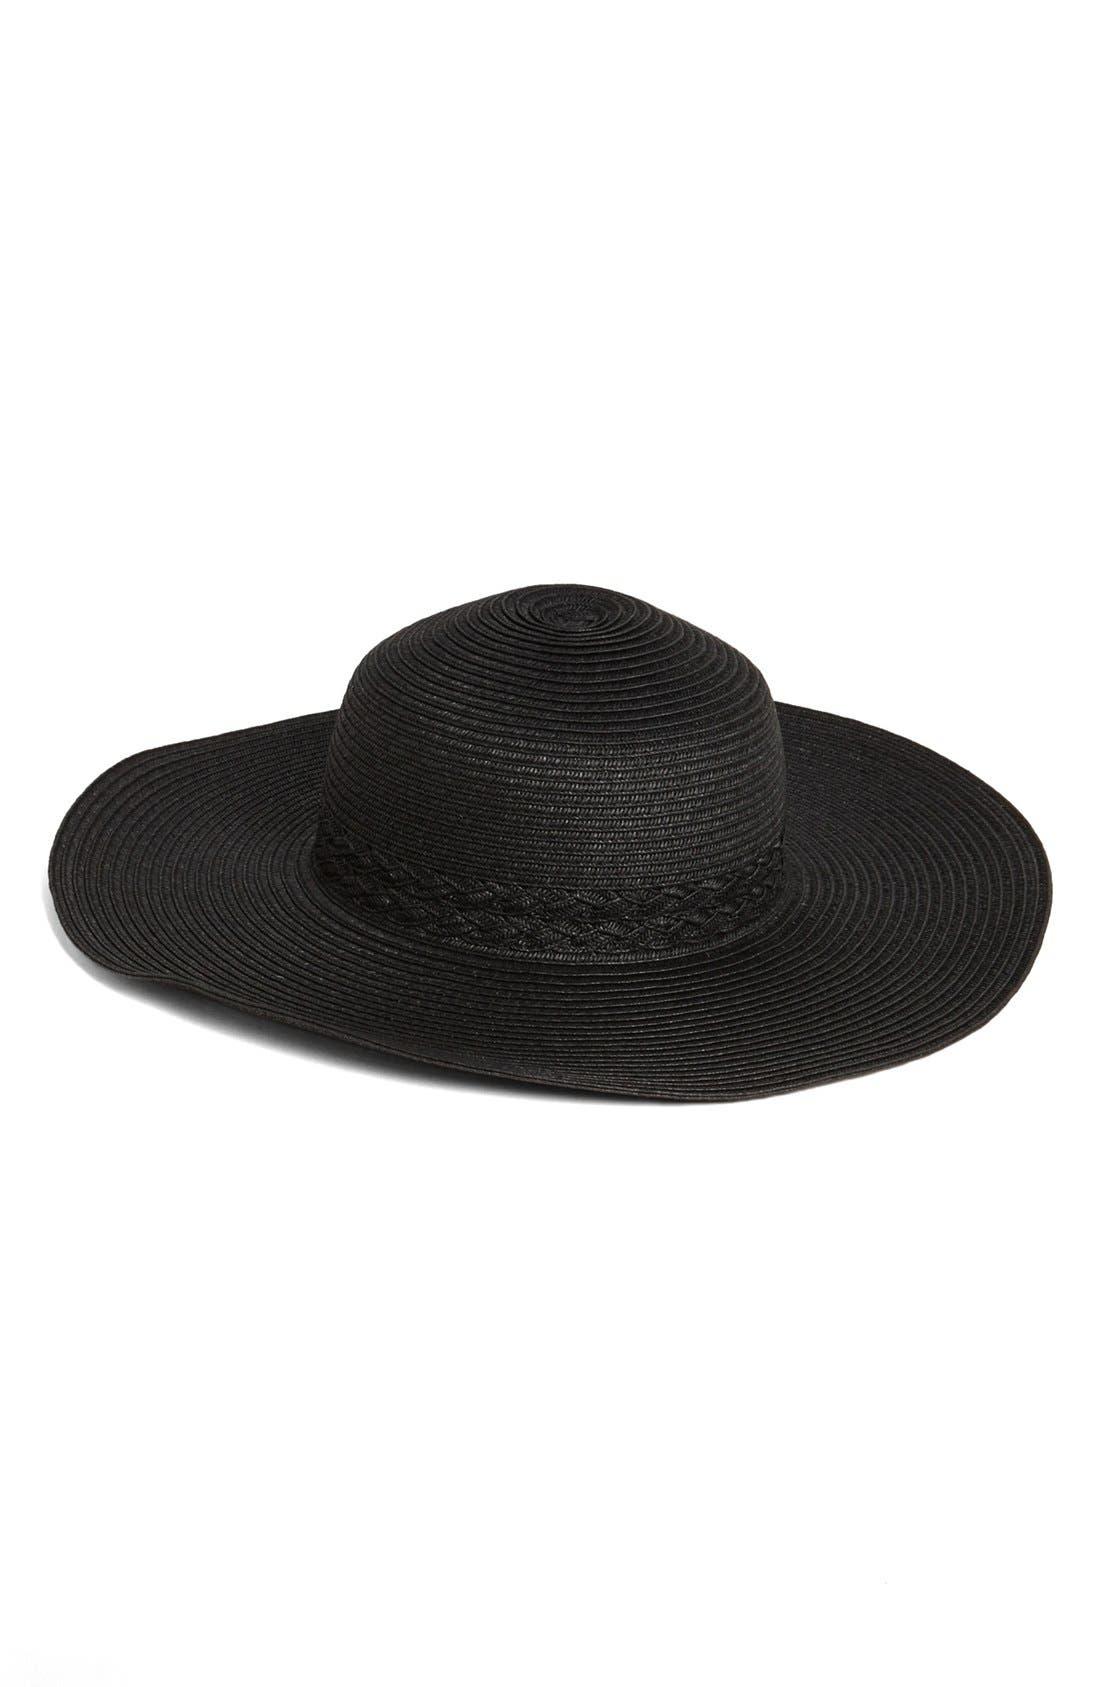 Main Image - Nordstrom Wide Brim Hat